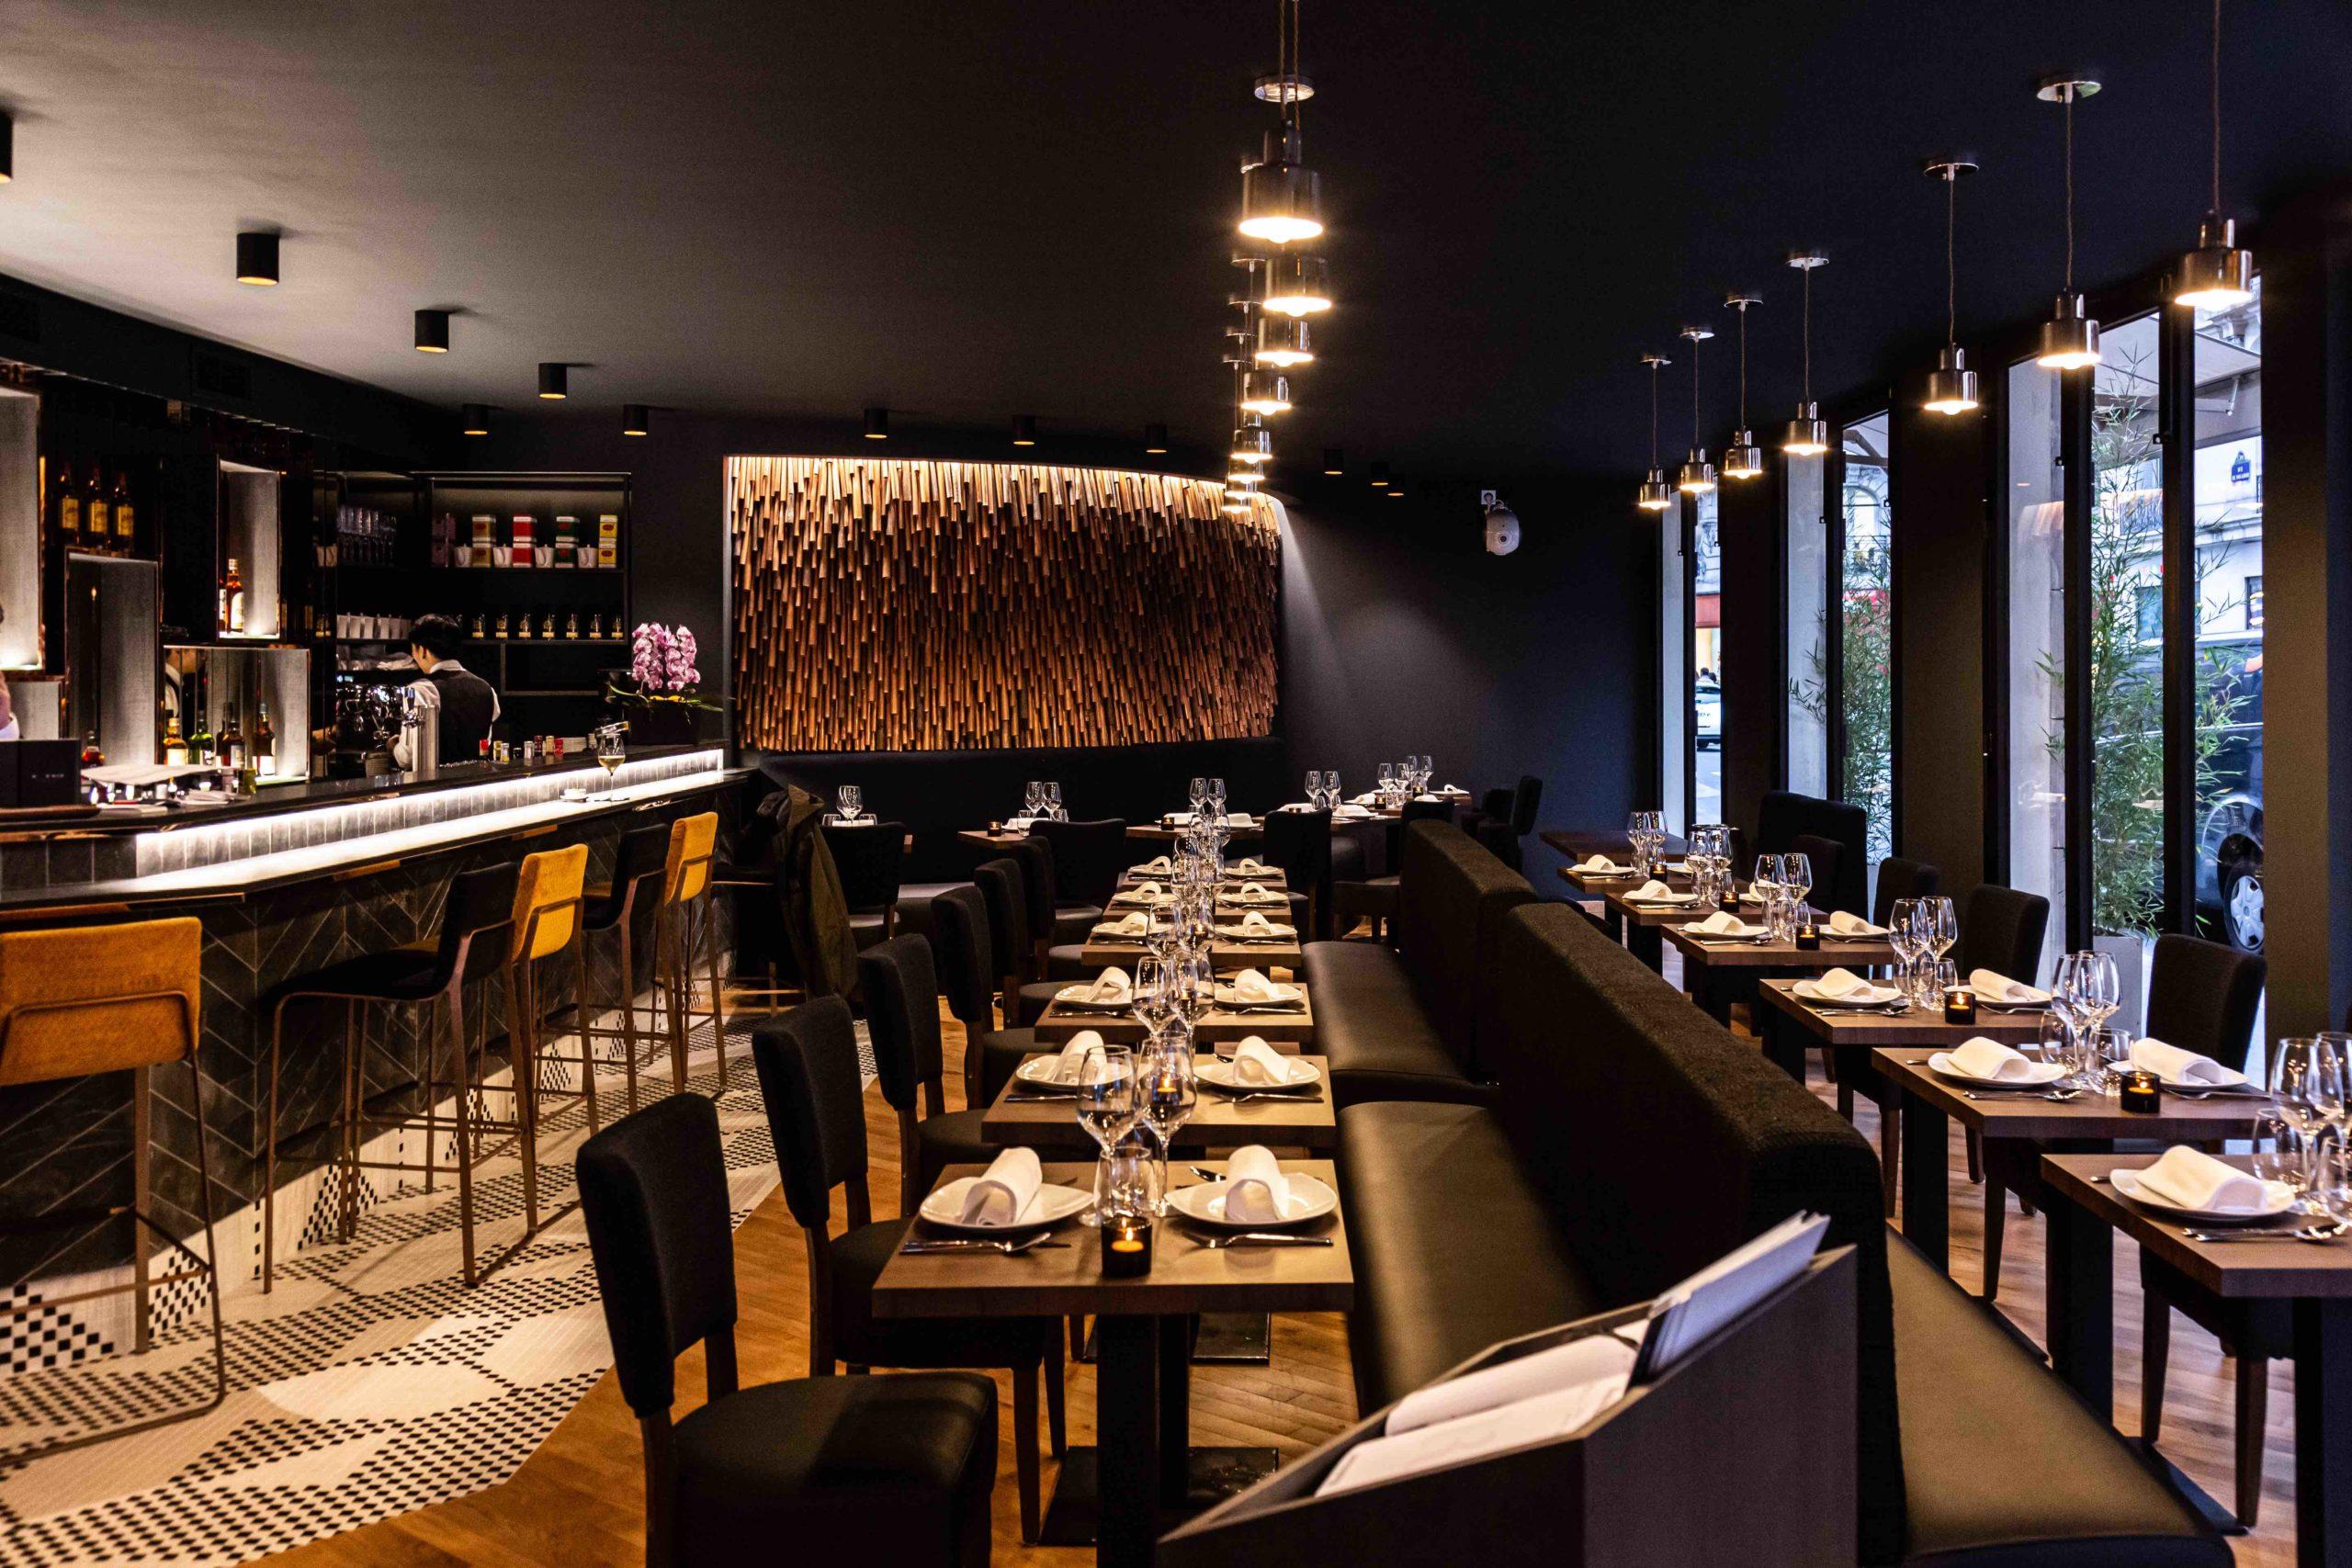 moom mam restaurant bistronomie thai paris 11